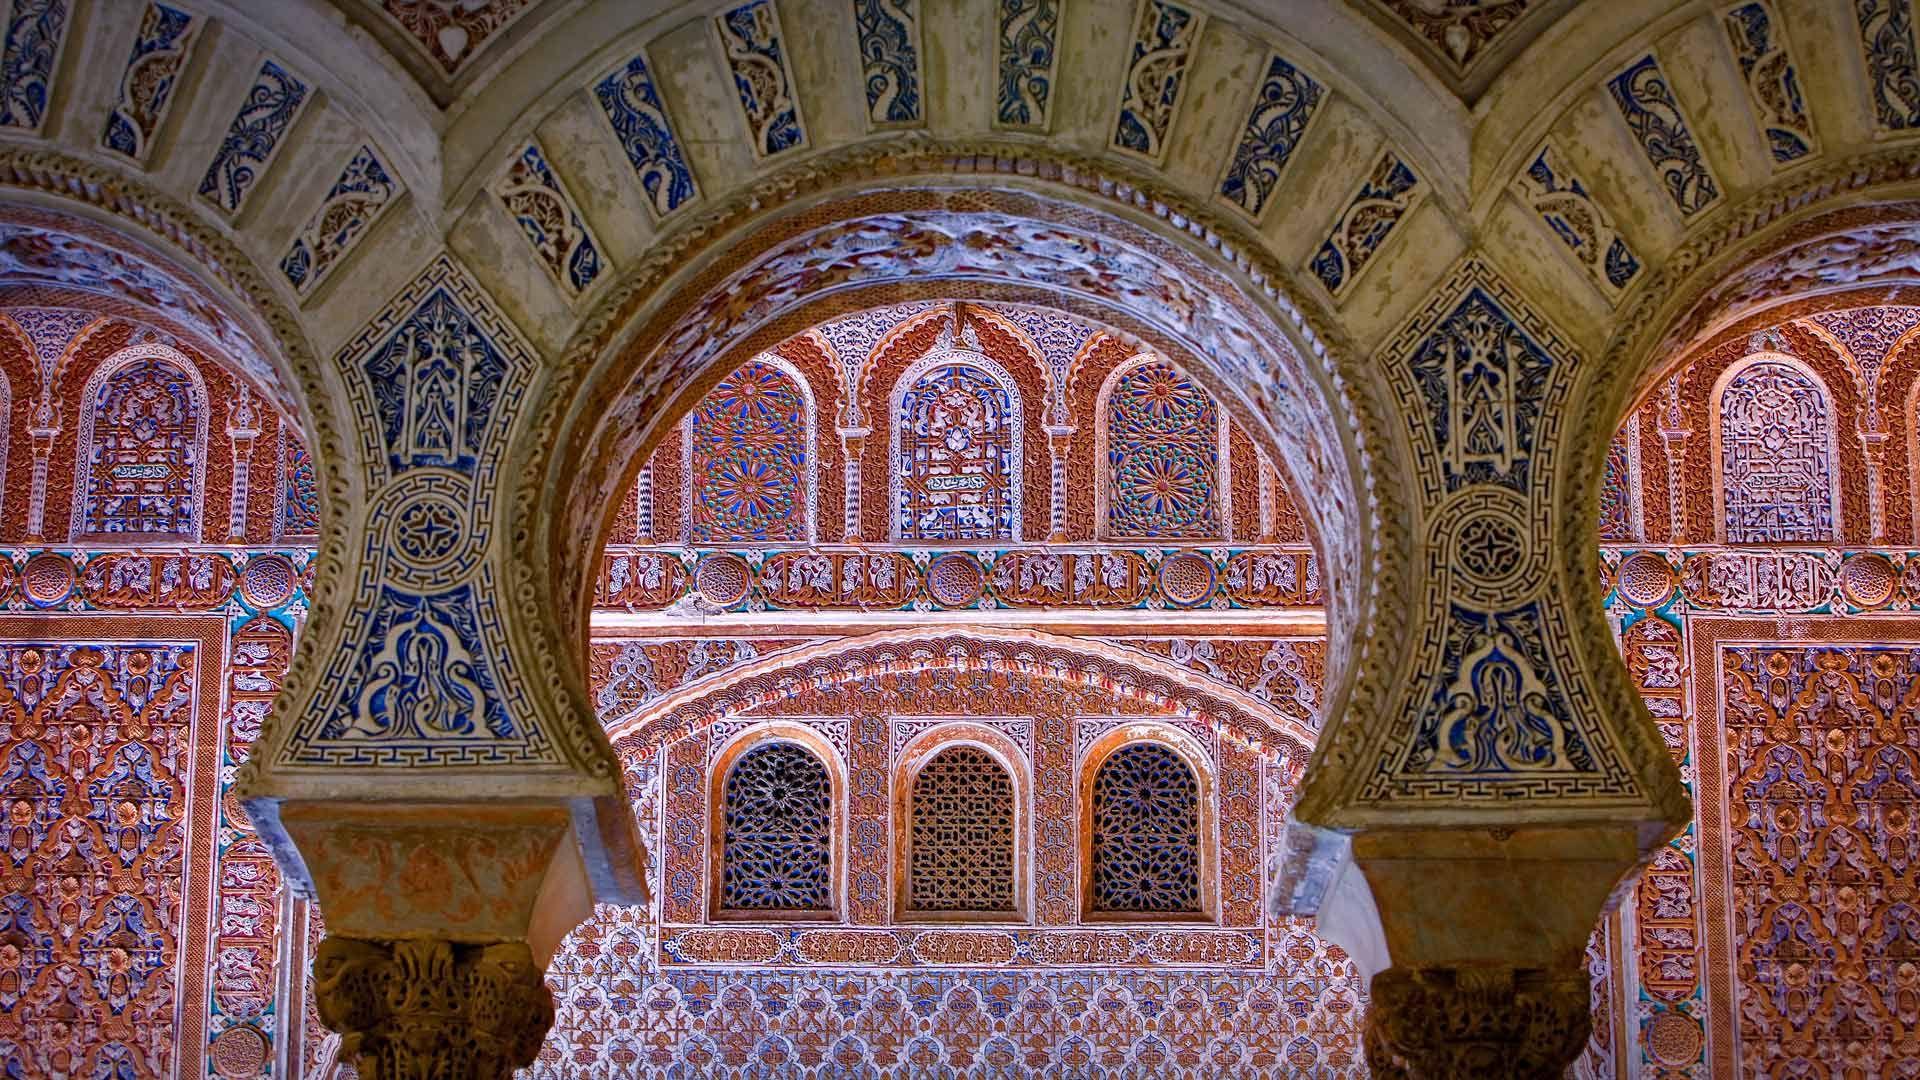 Ambassador s Hall in the Alcázar of Seville Spain © Lucas Vallecillos age fotostock